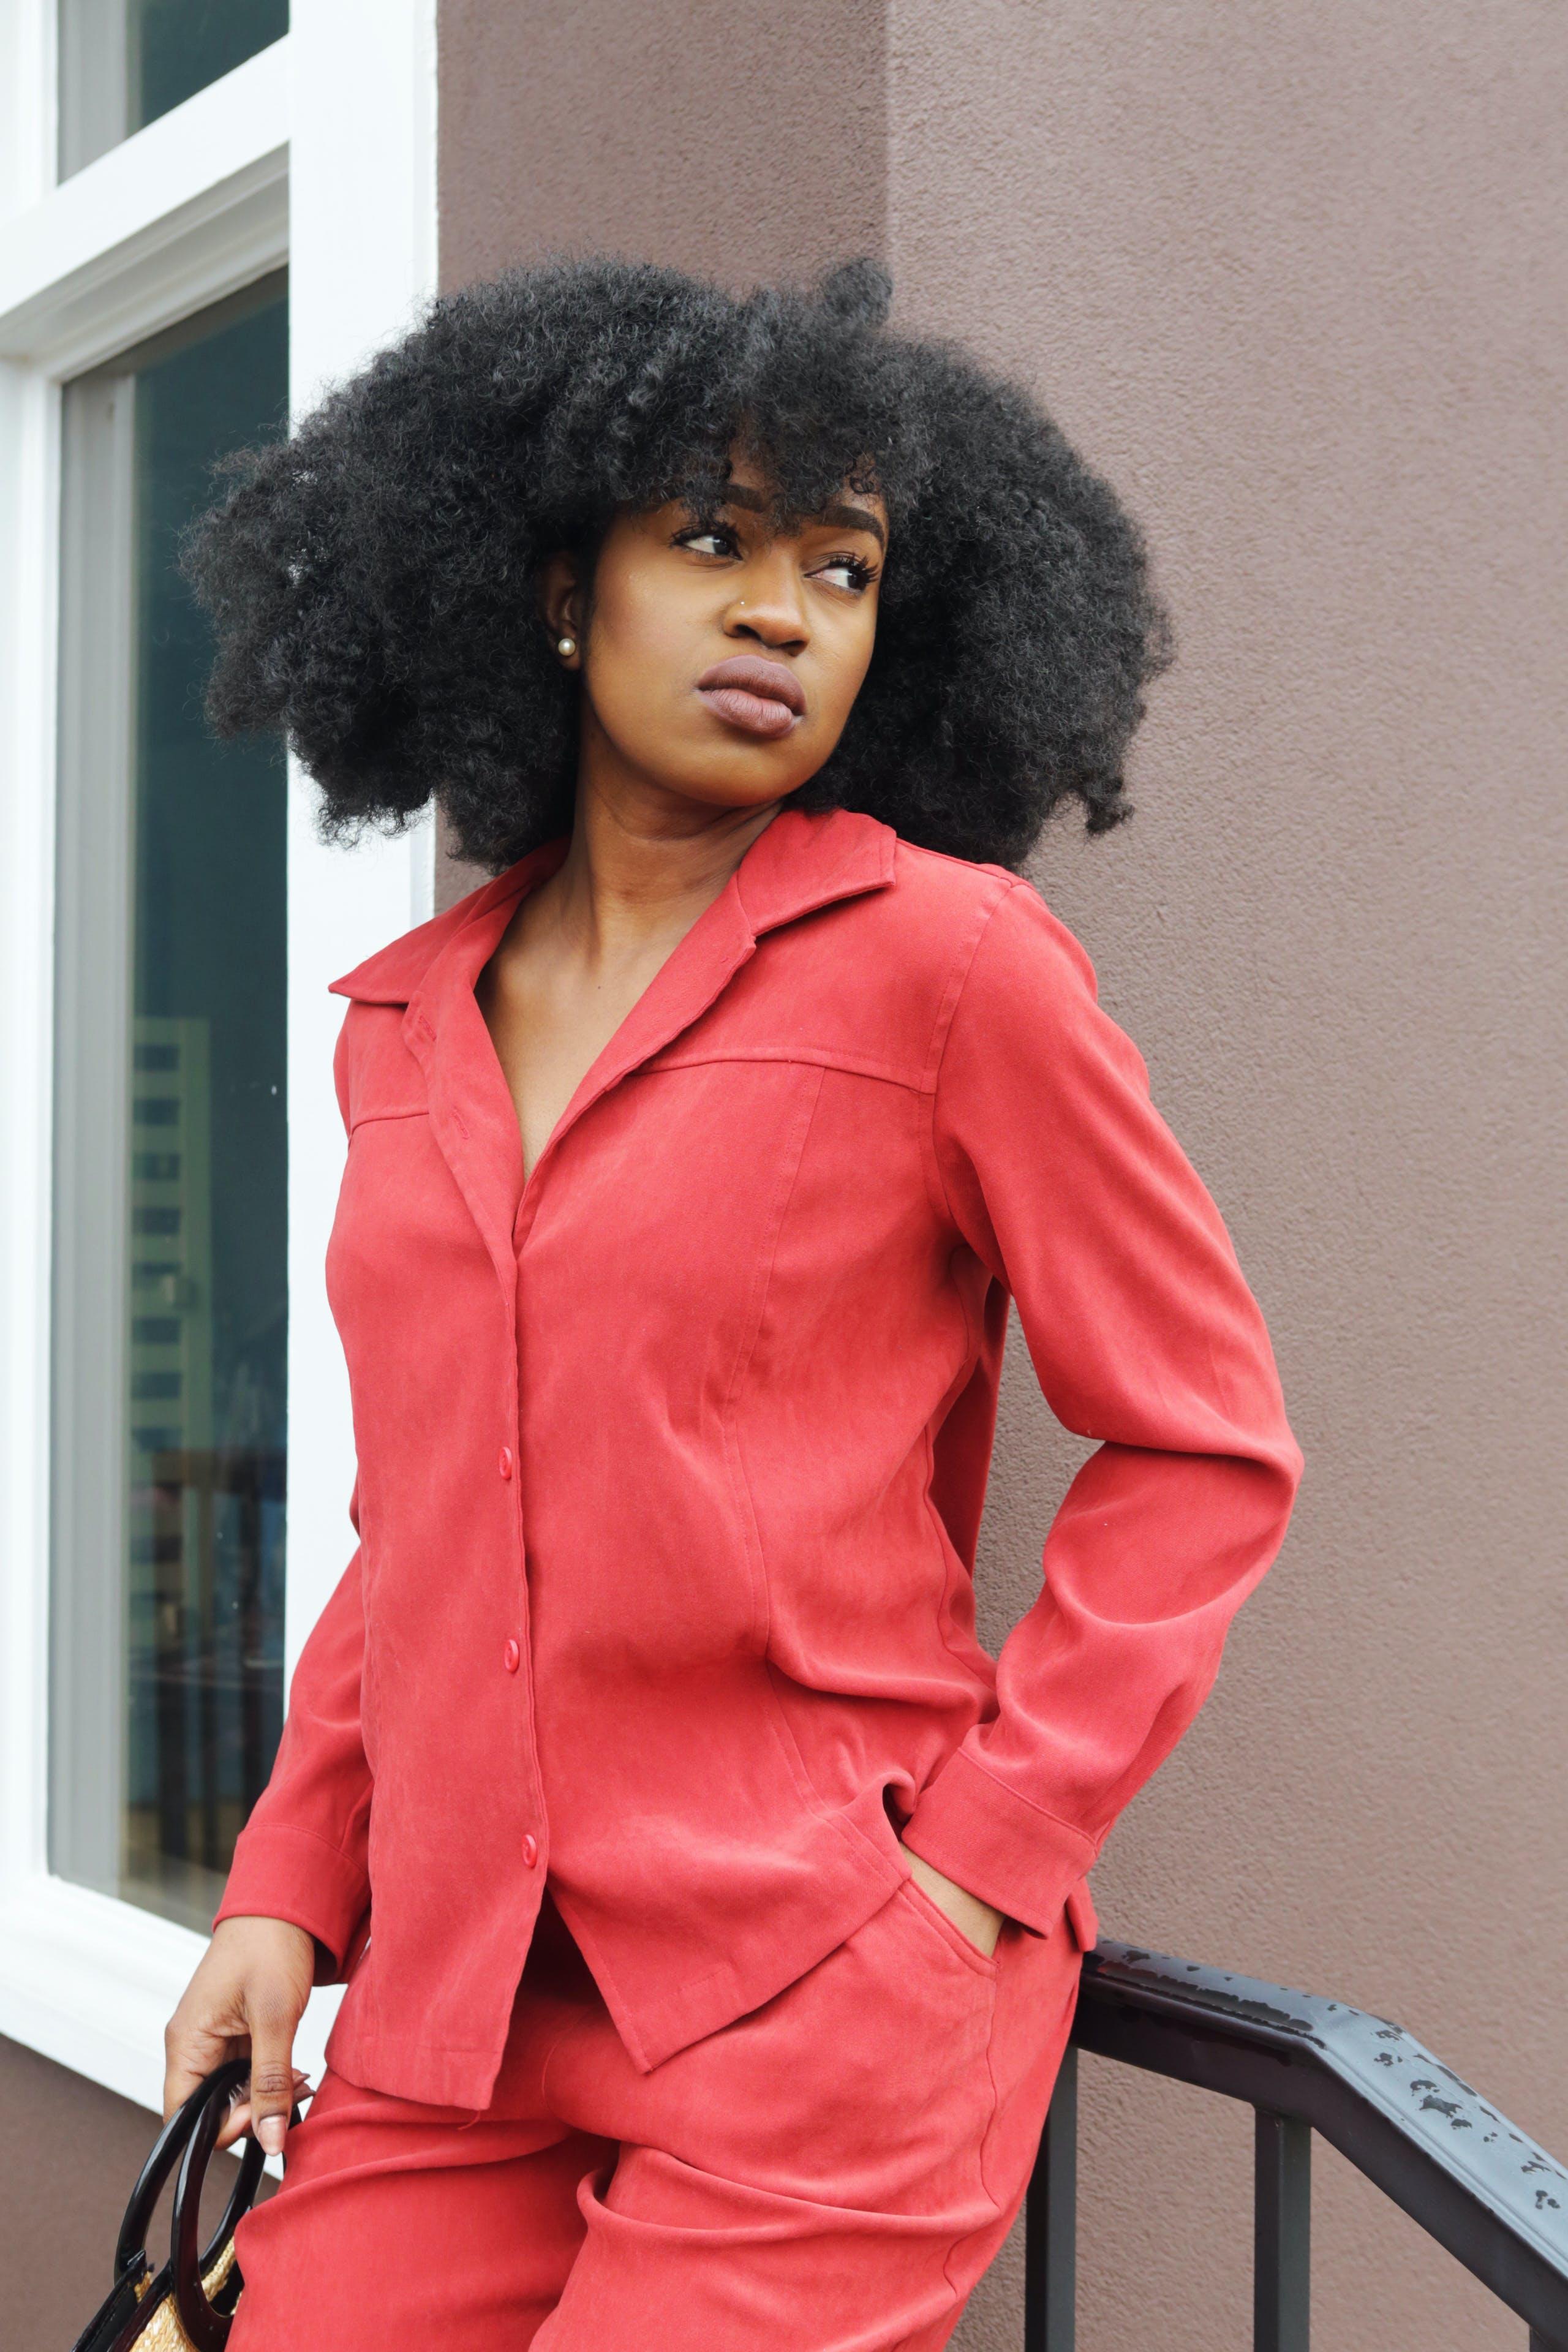 Fotos de stock gratuitas de actitud, africano, afro, atuendo